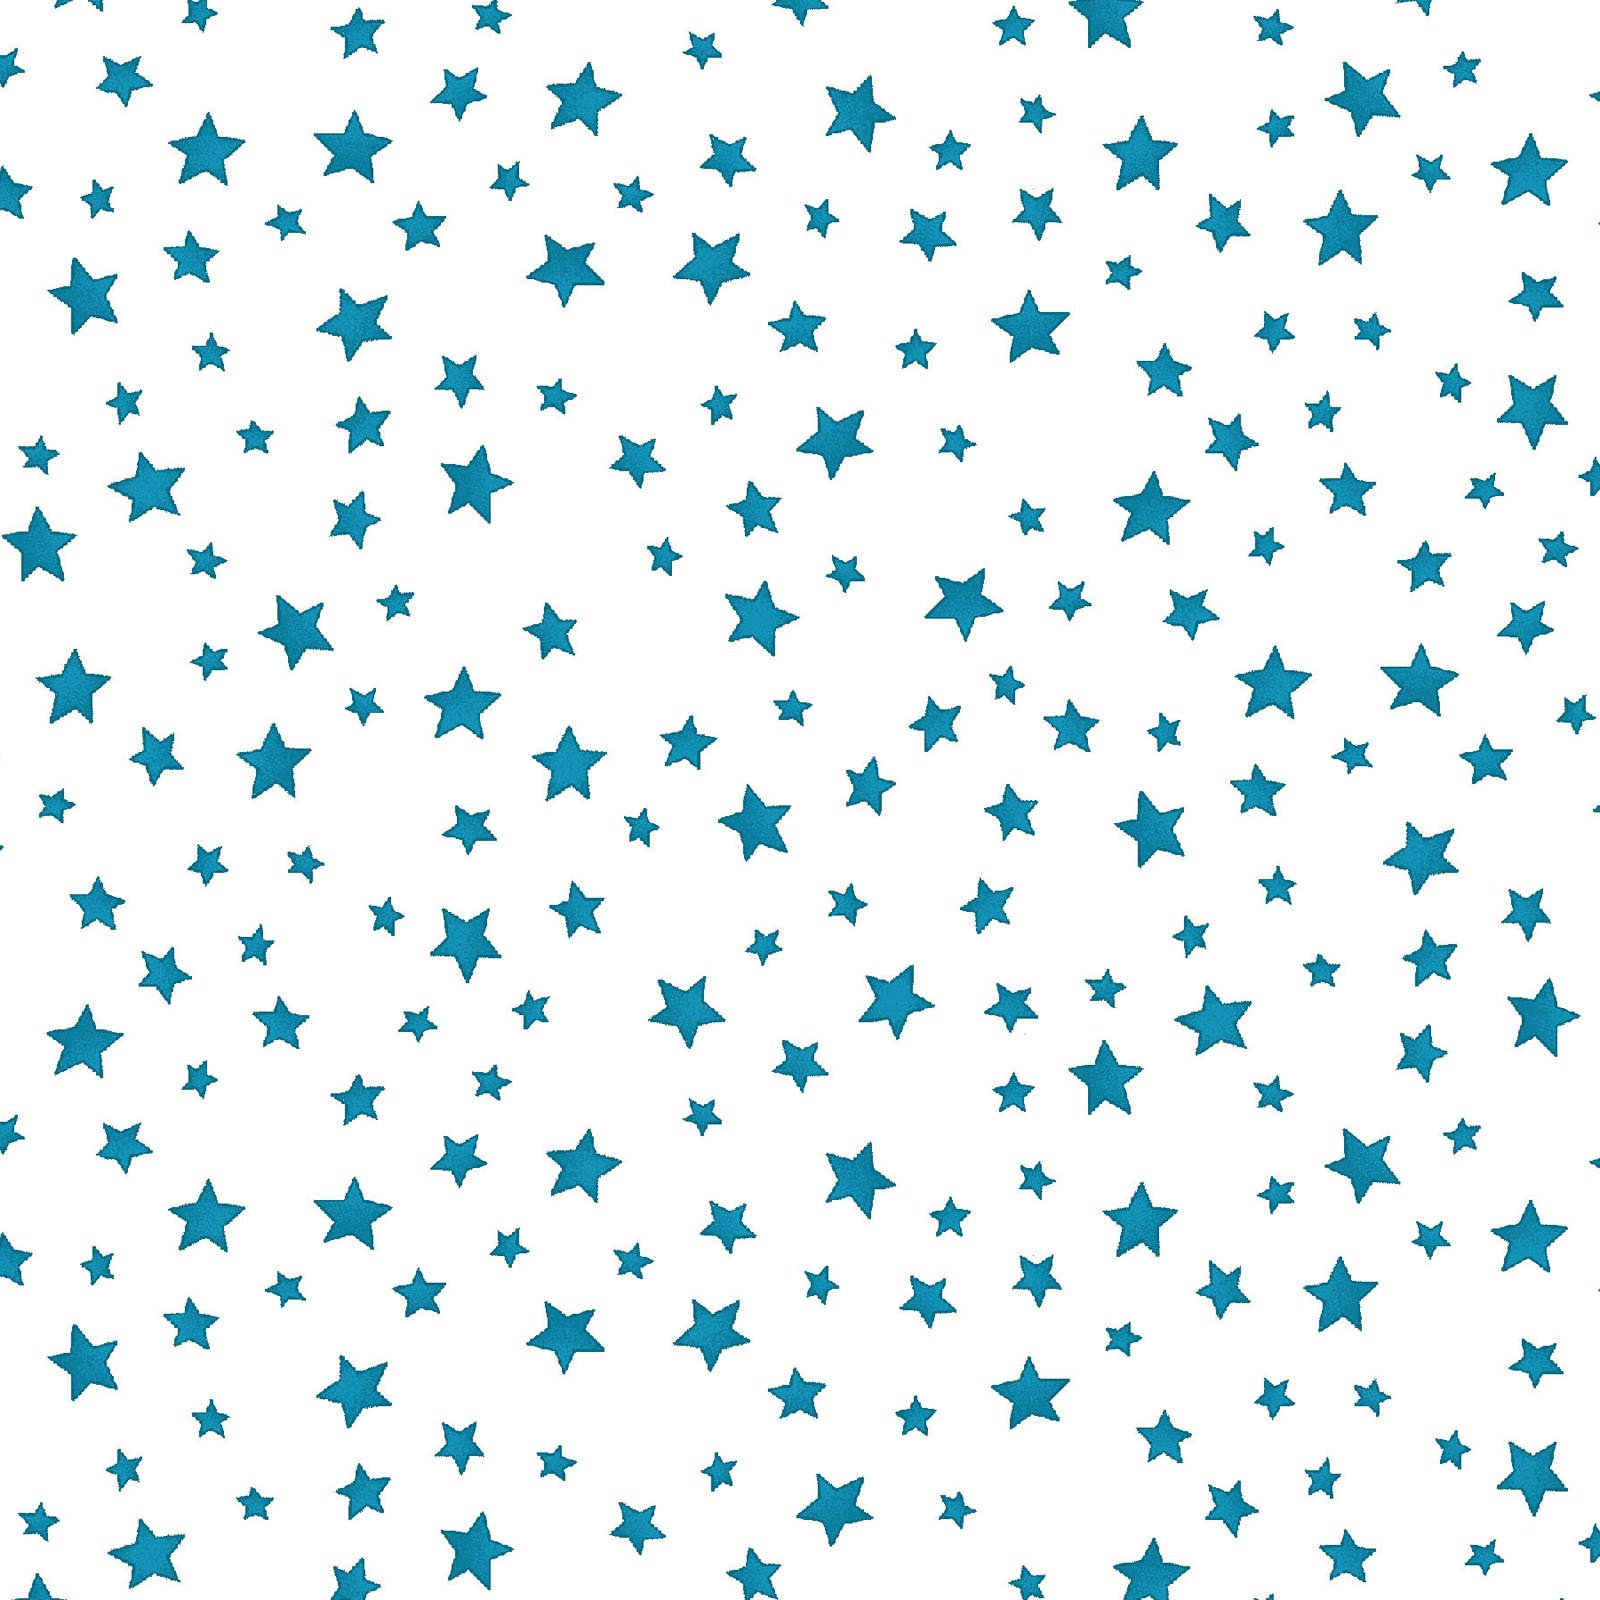 Back Porch Celebration - Blue Stars on White